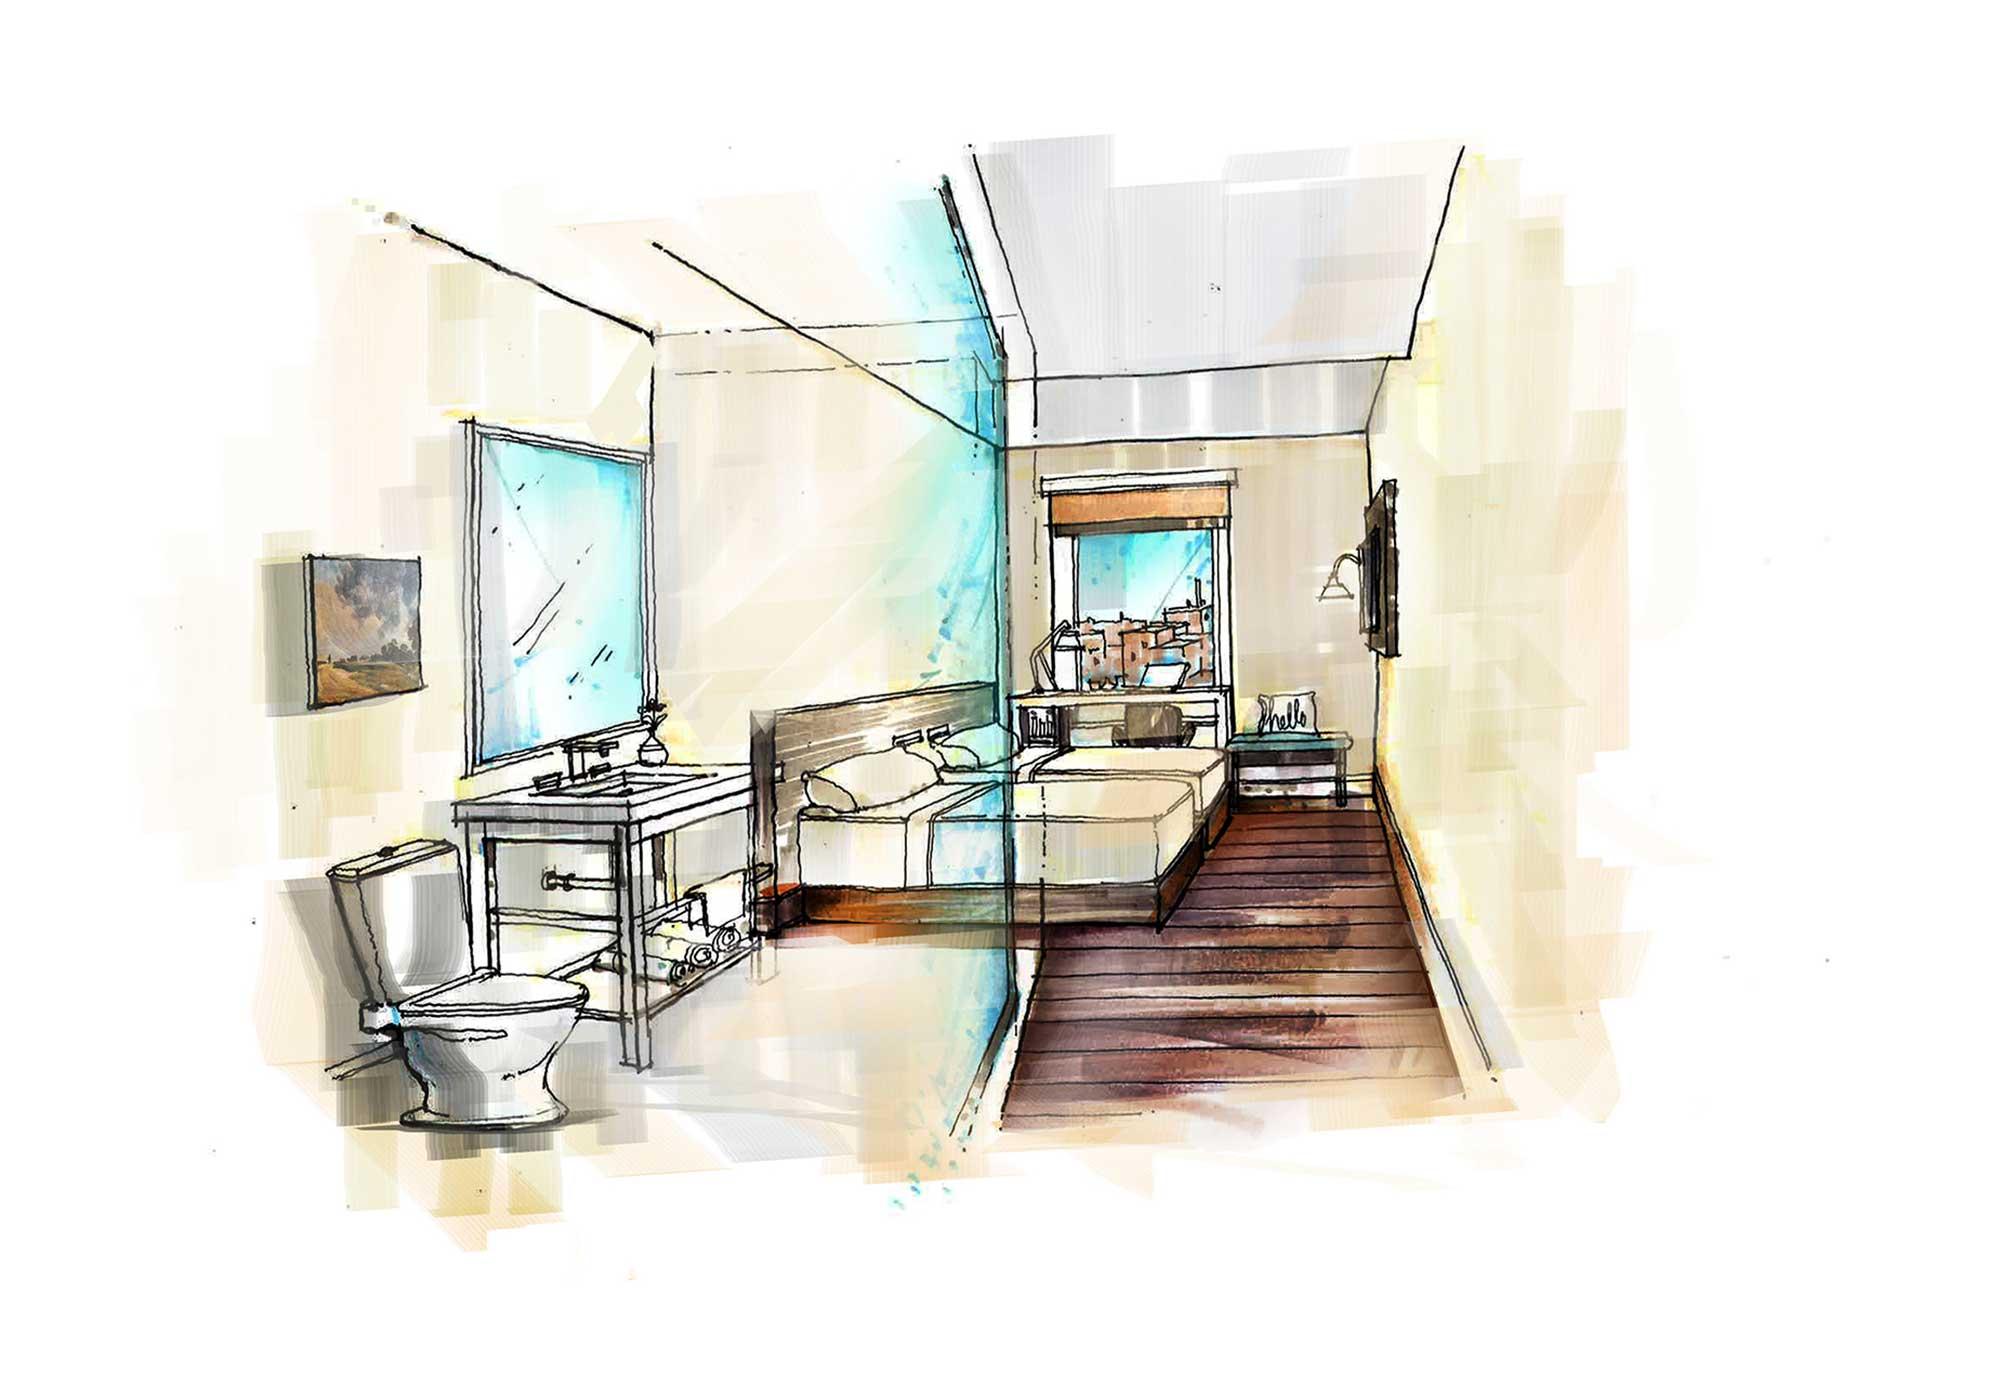 Watercolor rendering of a bedroom